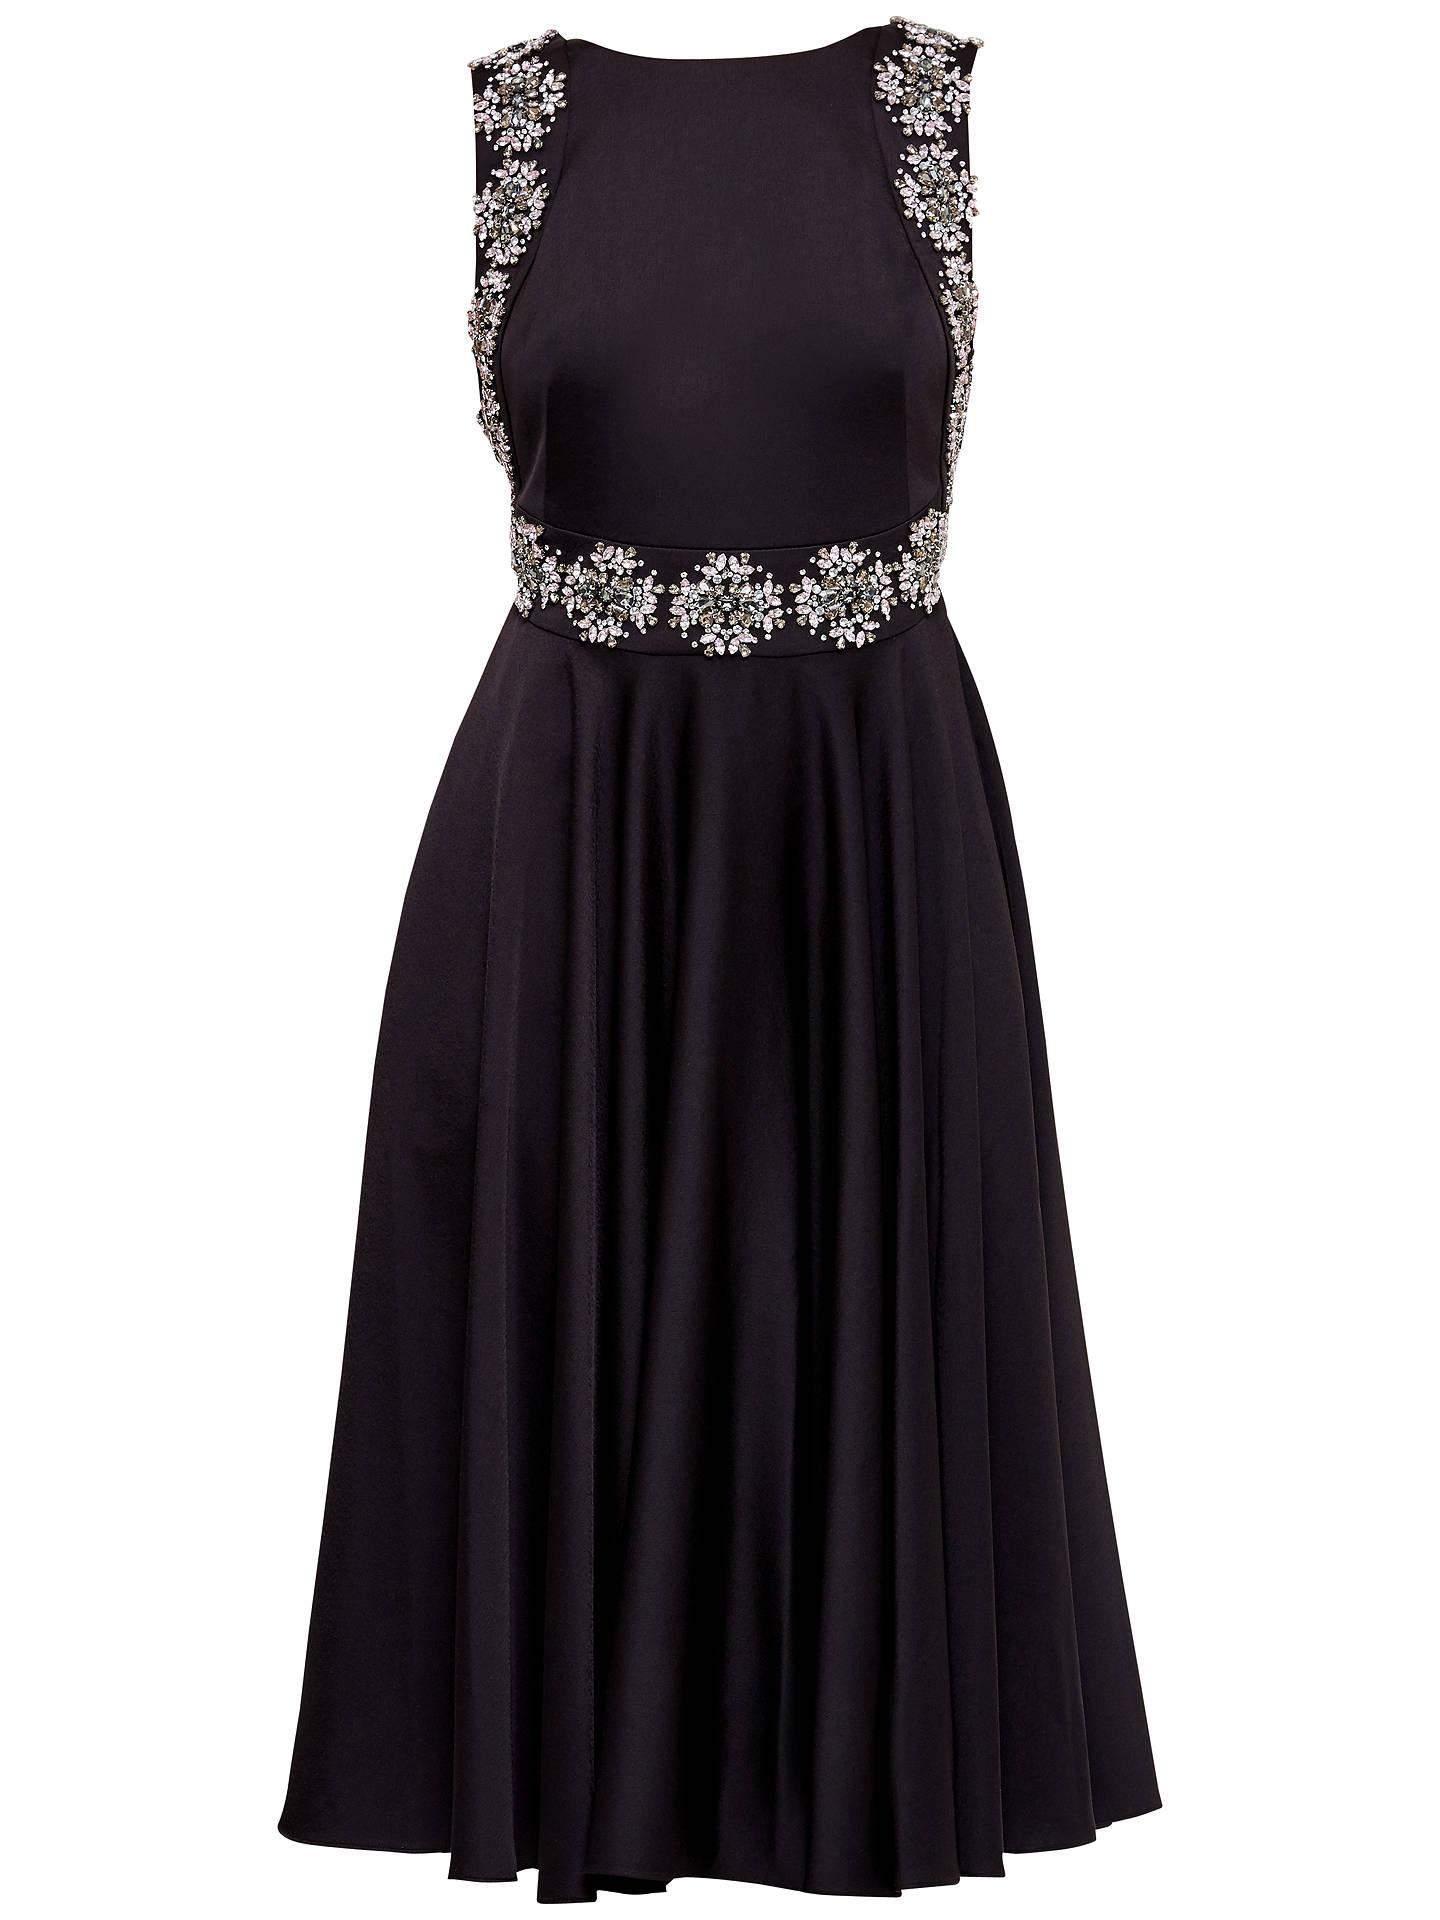 1090607f5 Buy Ted Baker Jirina Embellished Backless Dress